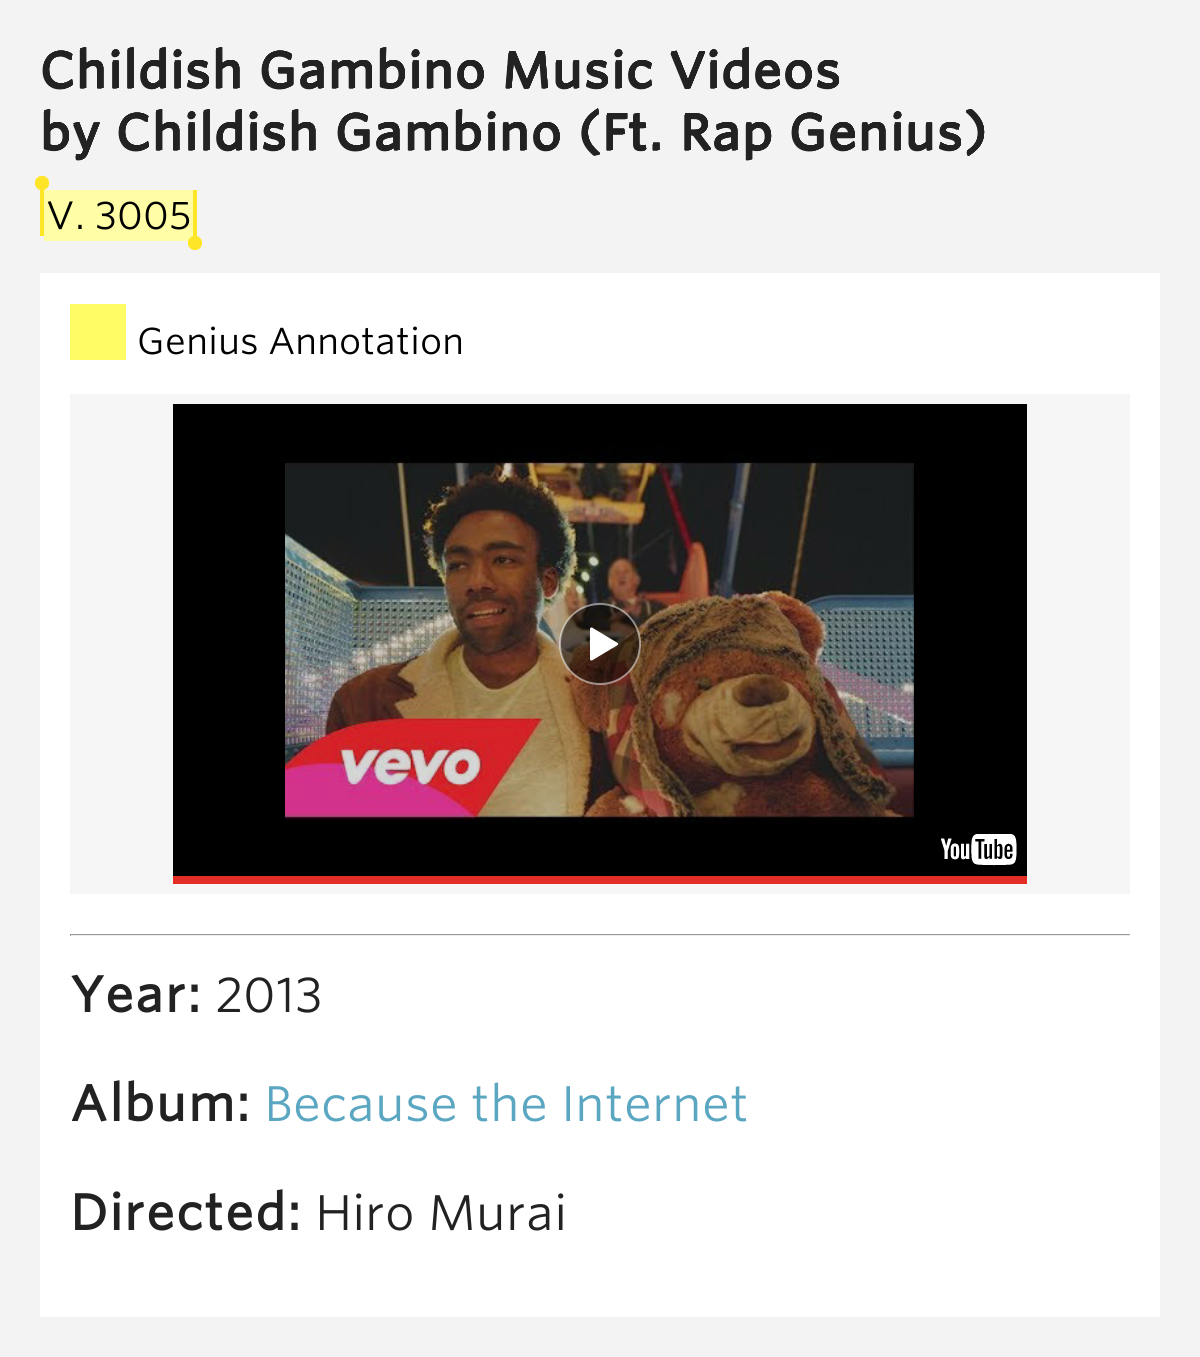 V. 3005 – Childish Gambino Music Videos Meaning